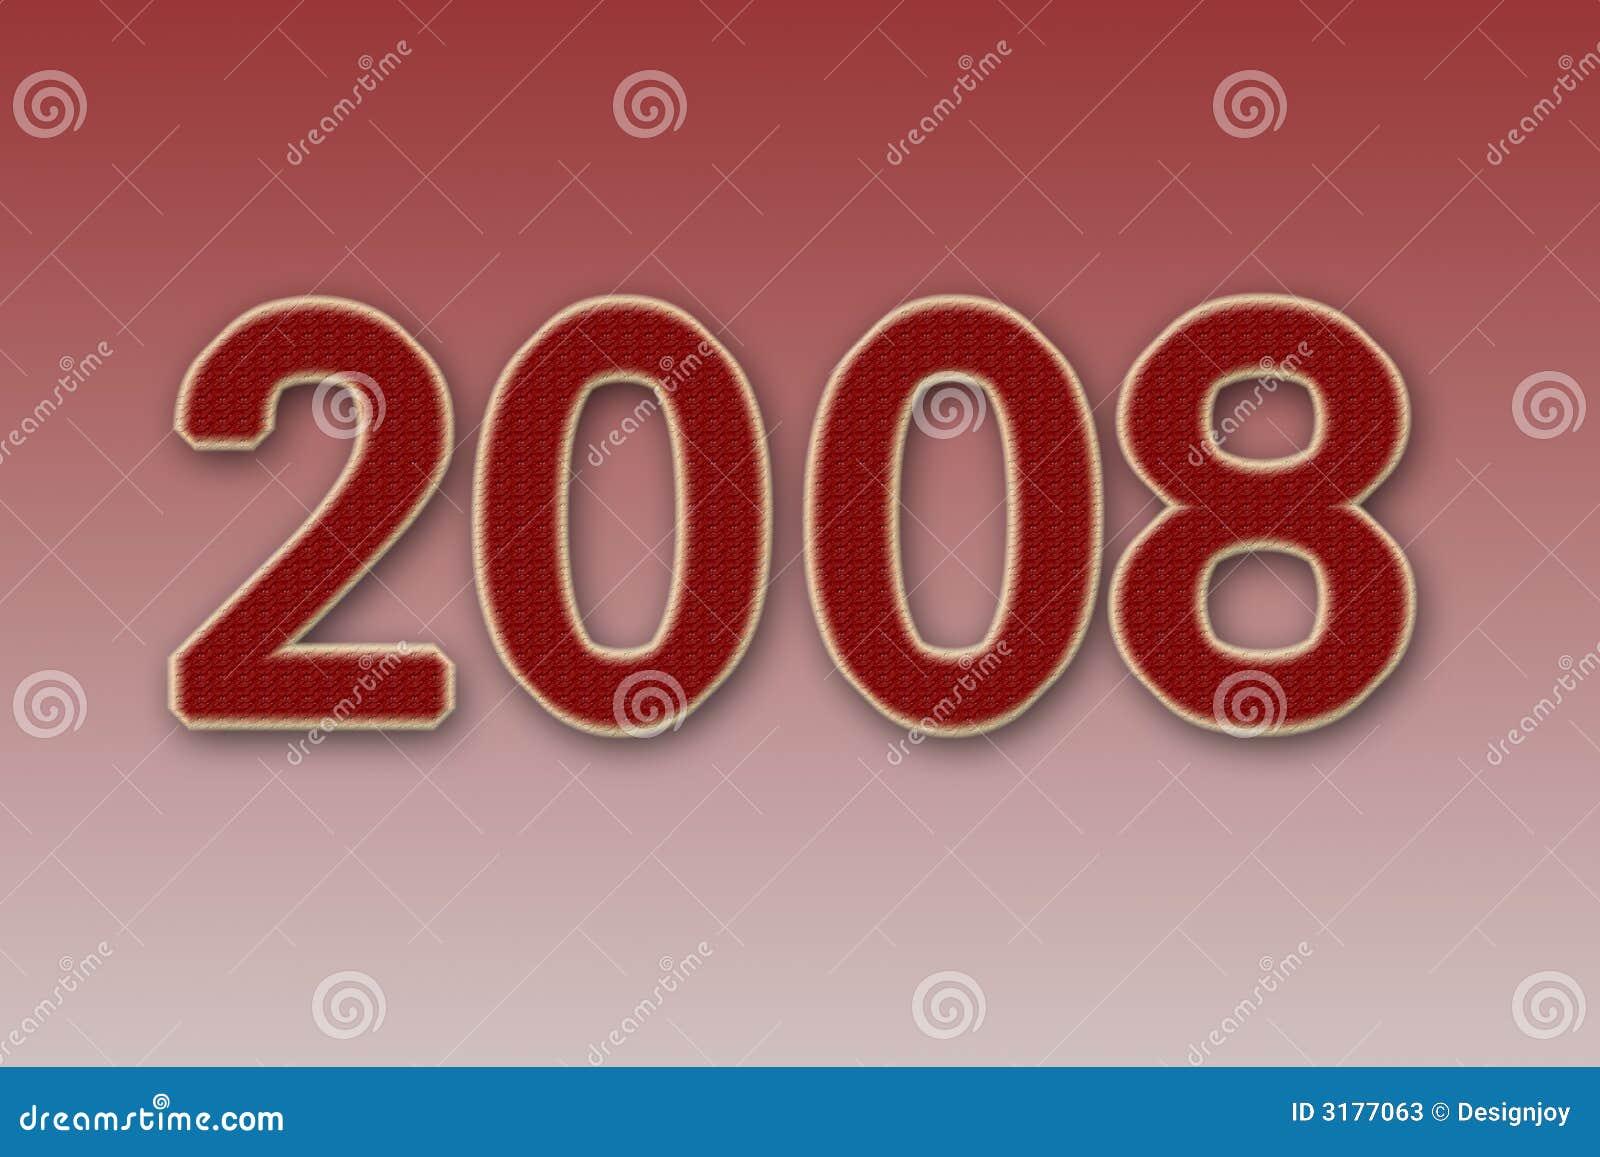 New year 2008